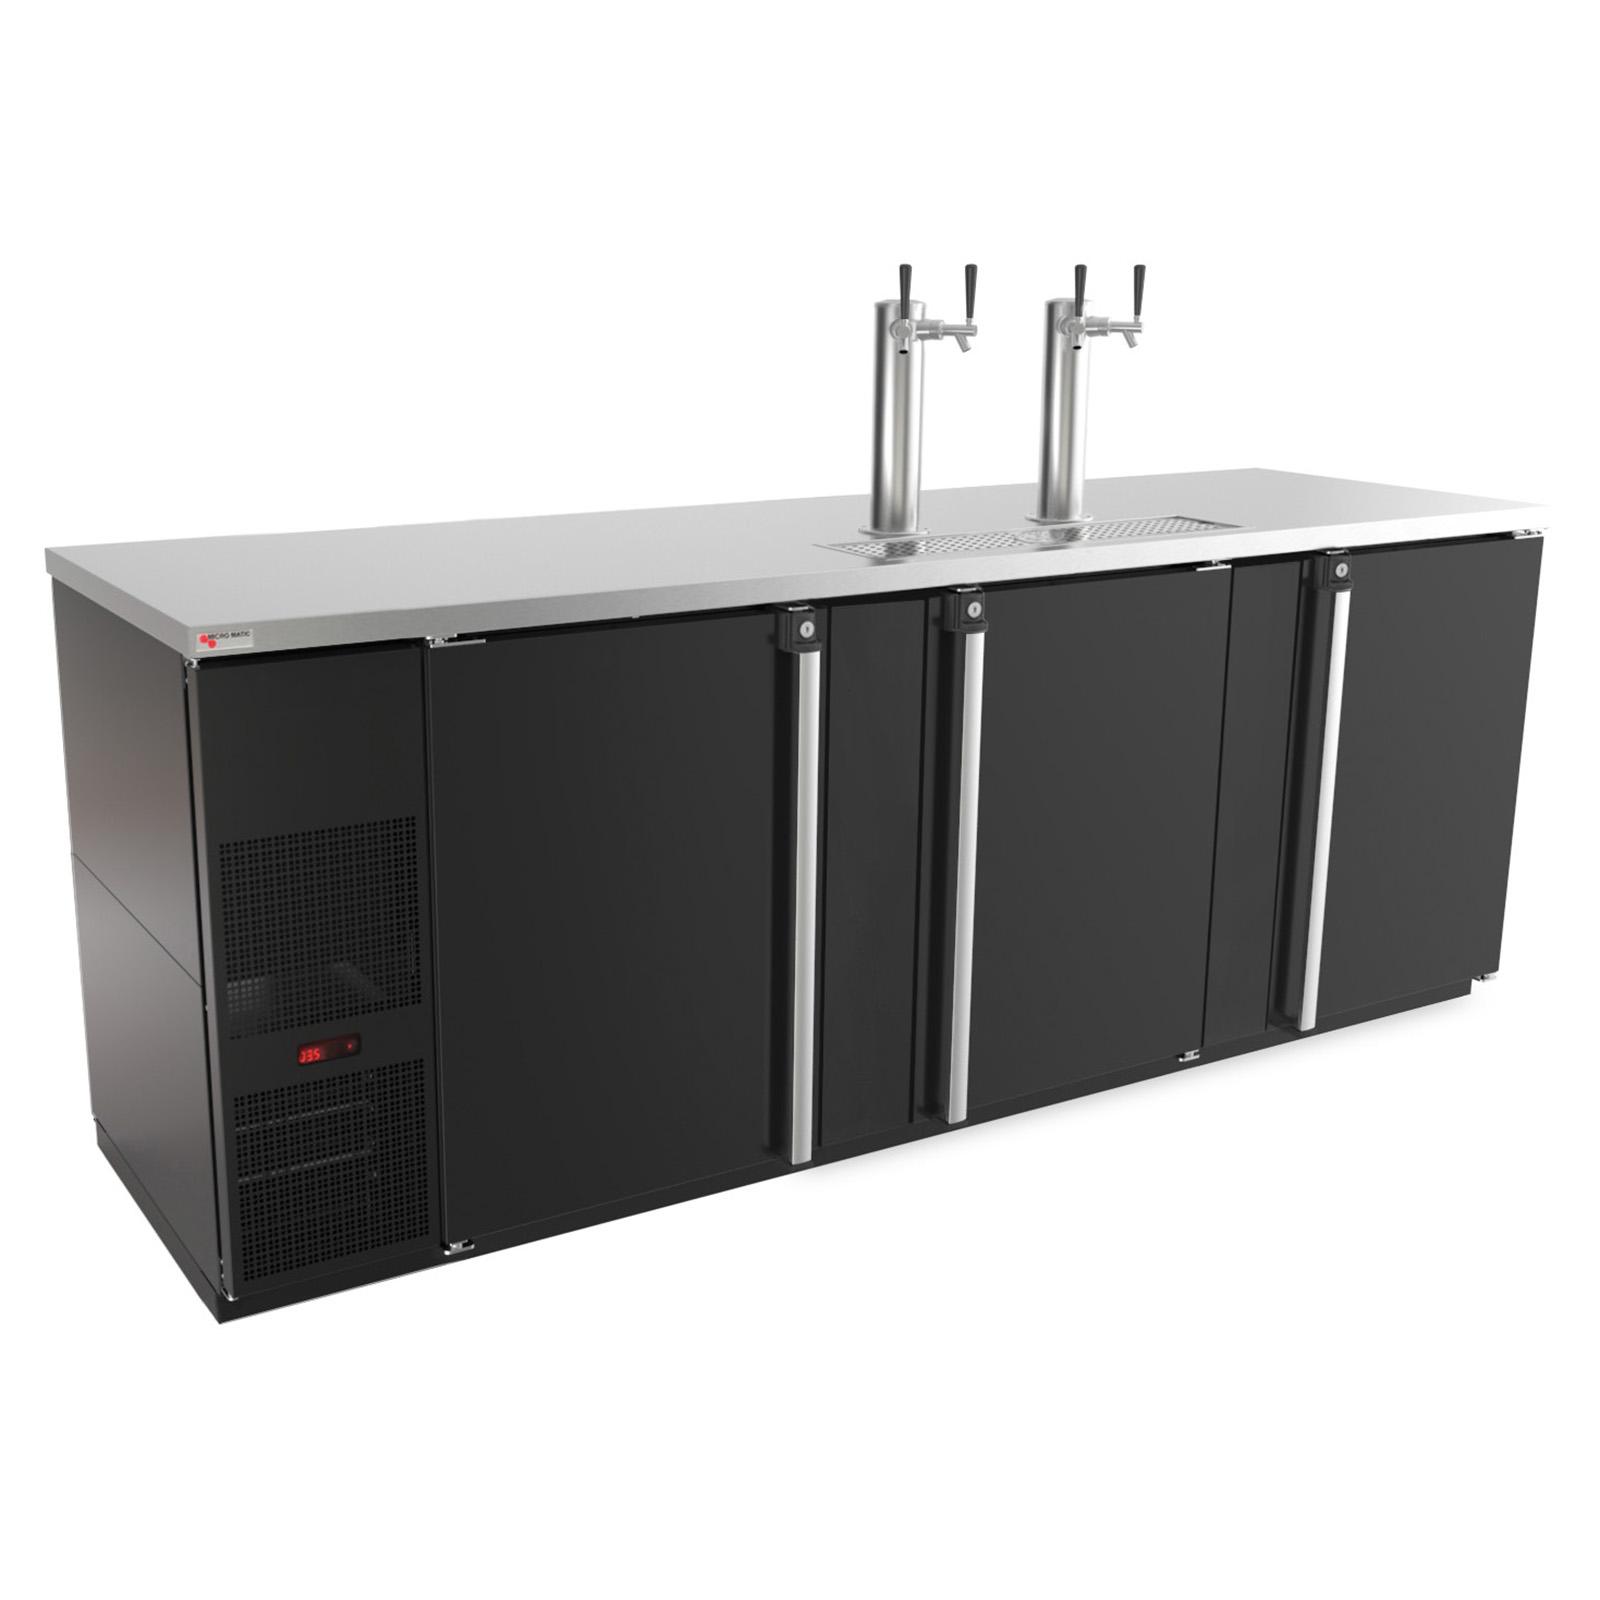 Micro Matic USA MDD94-E draft beer cooler